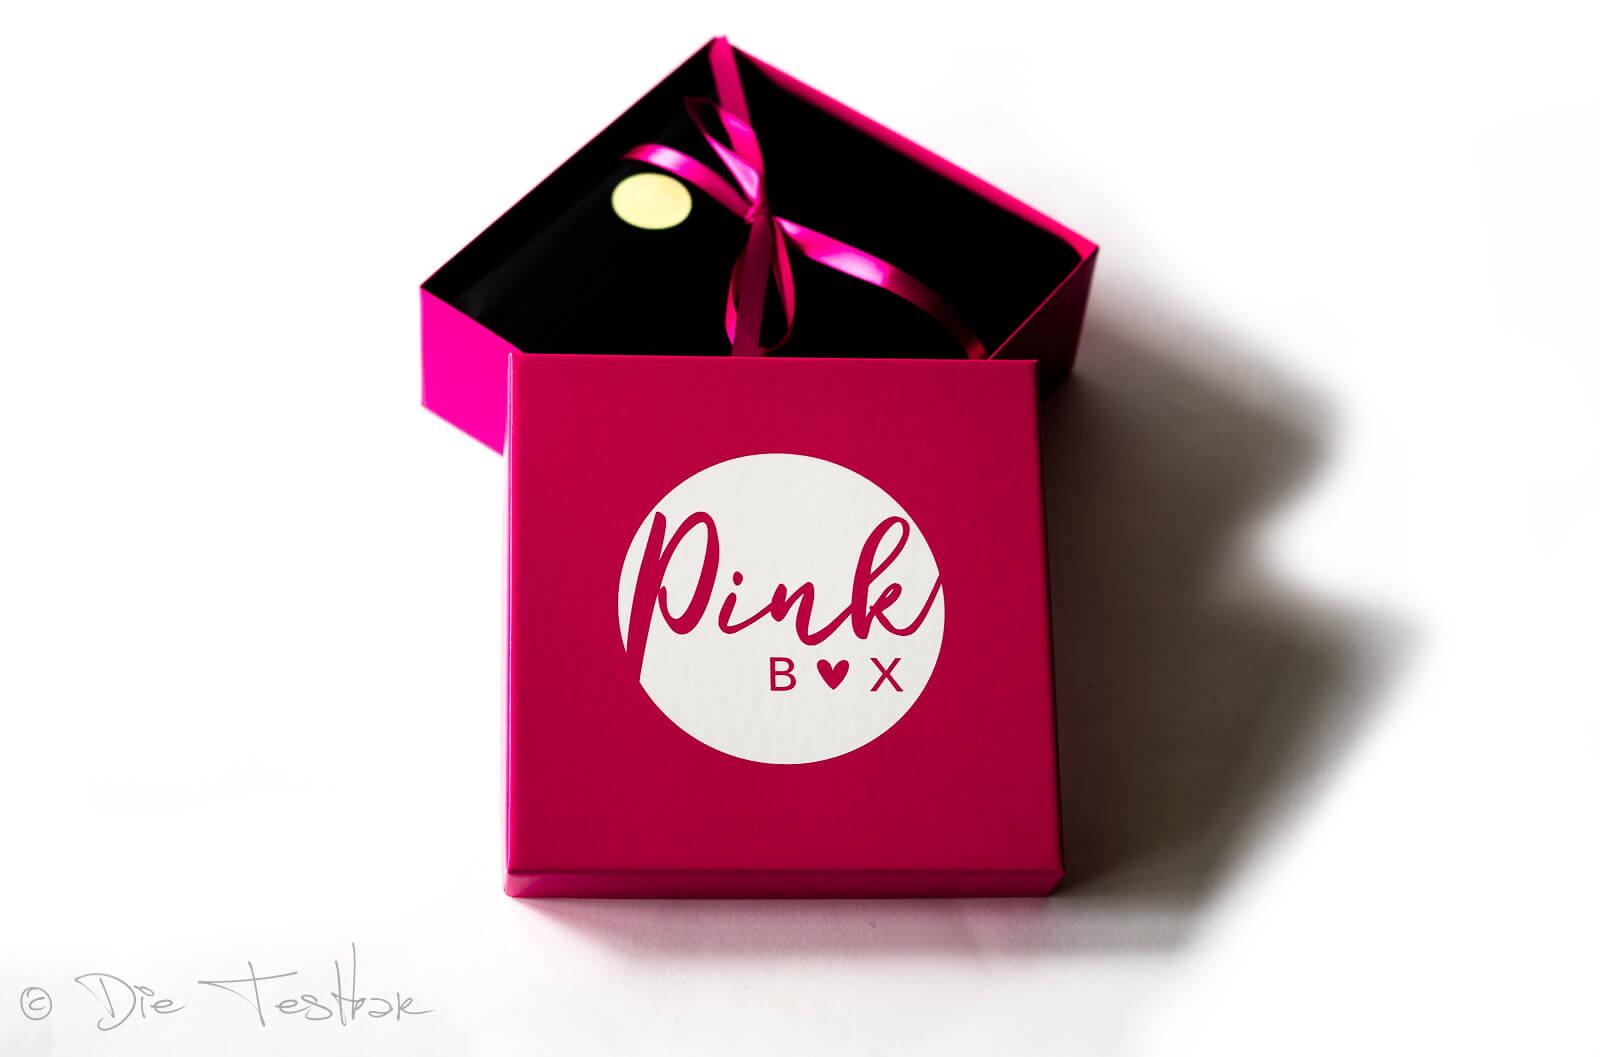 DIE PINK BOX im Mai 2021 – Pink Box Selflove Club 2021